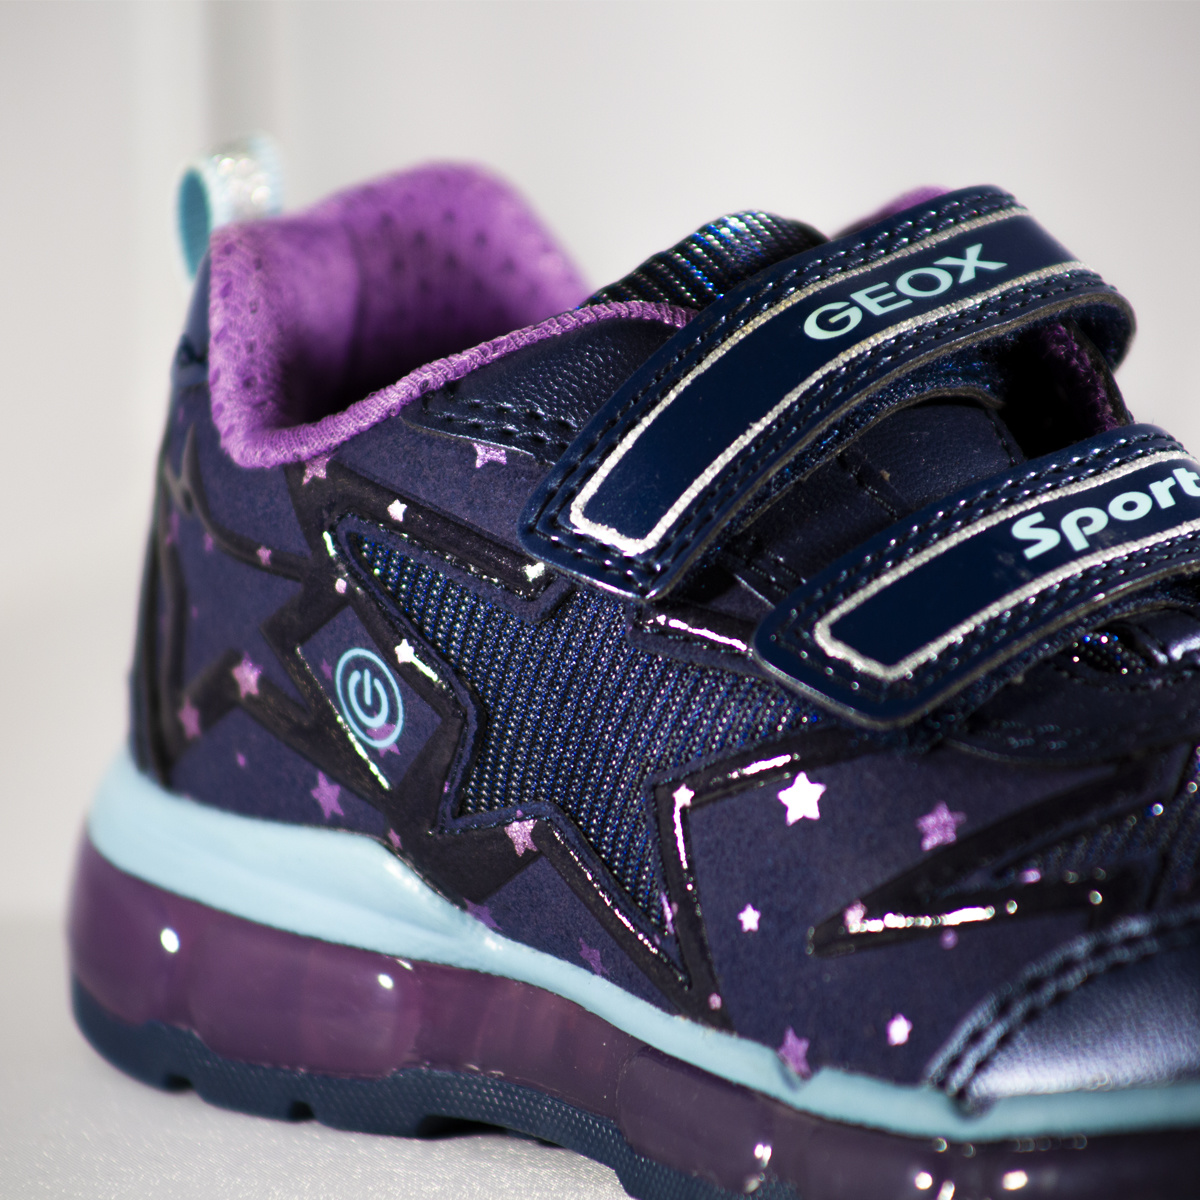 Geox Andriod Navy Purple